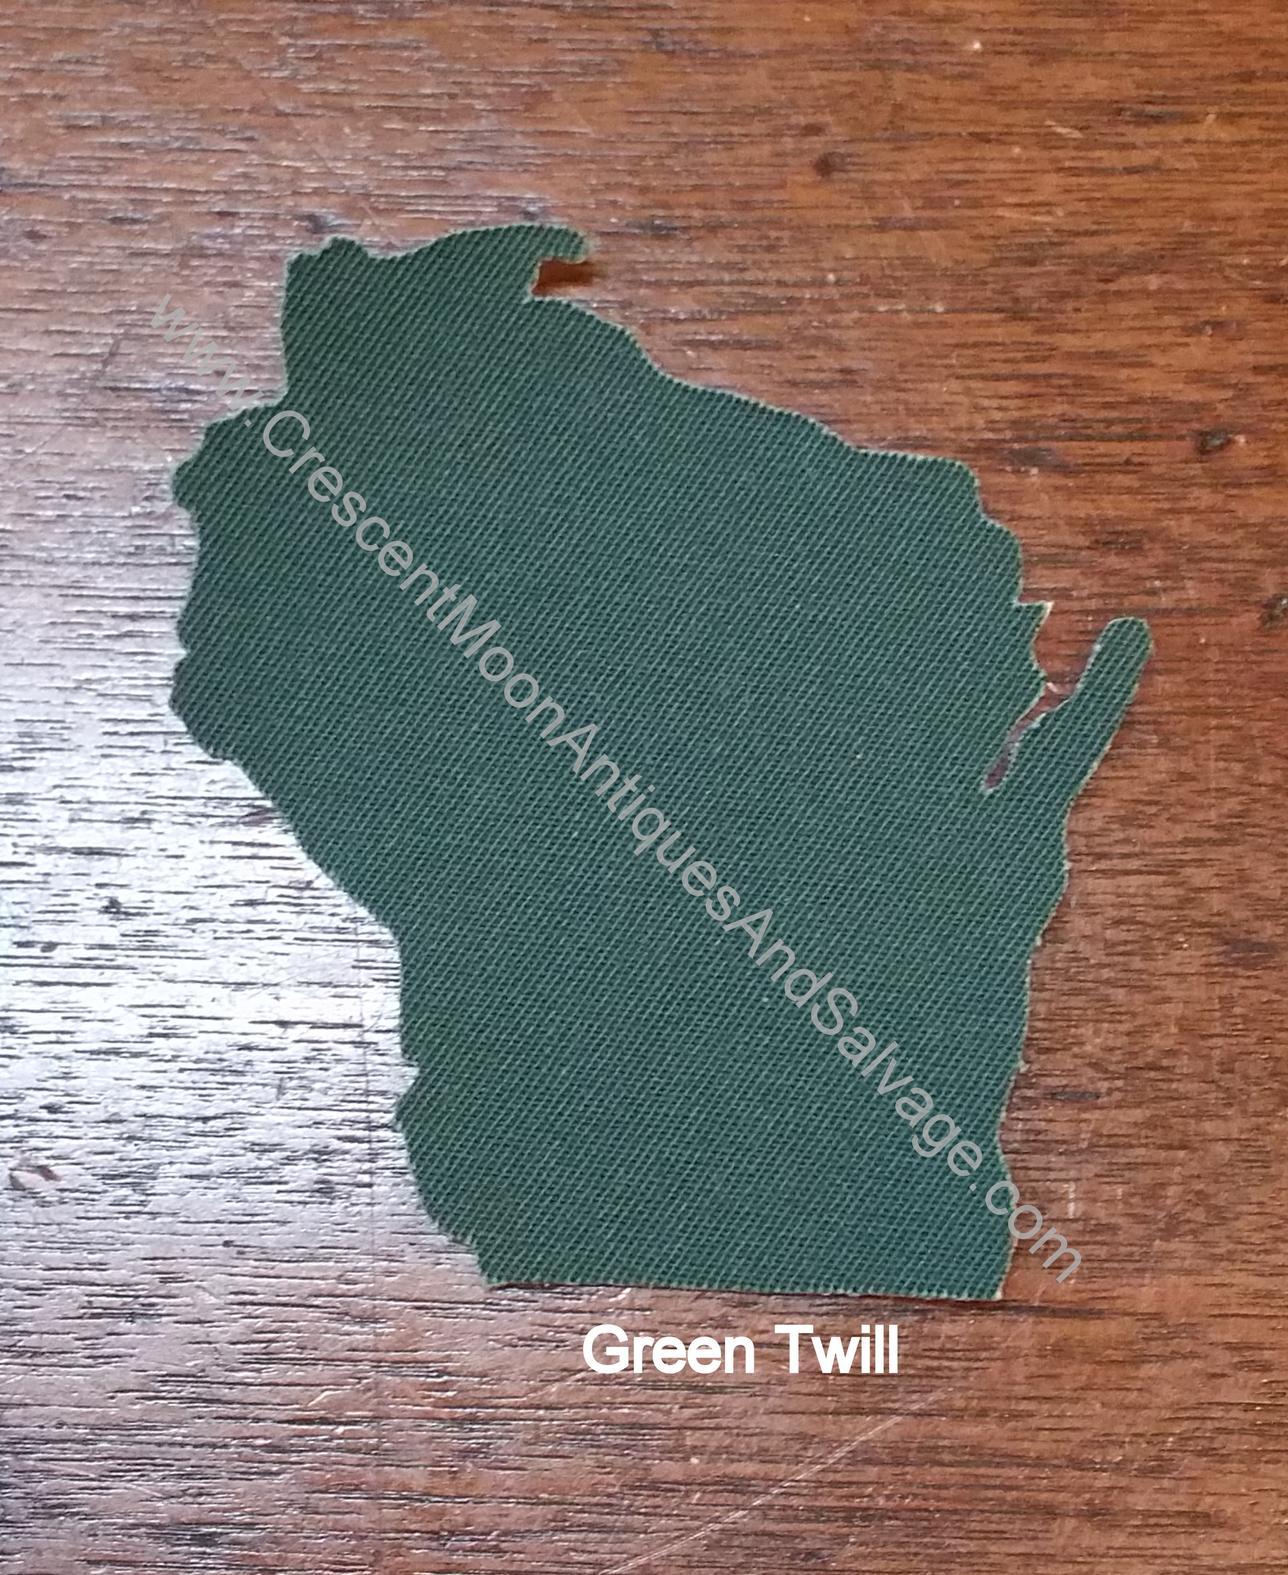 Oshkosh BGosh Green Twill WI Patch